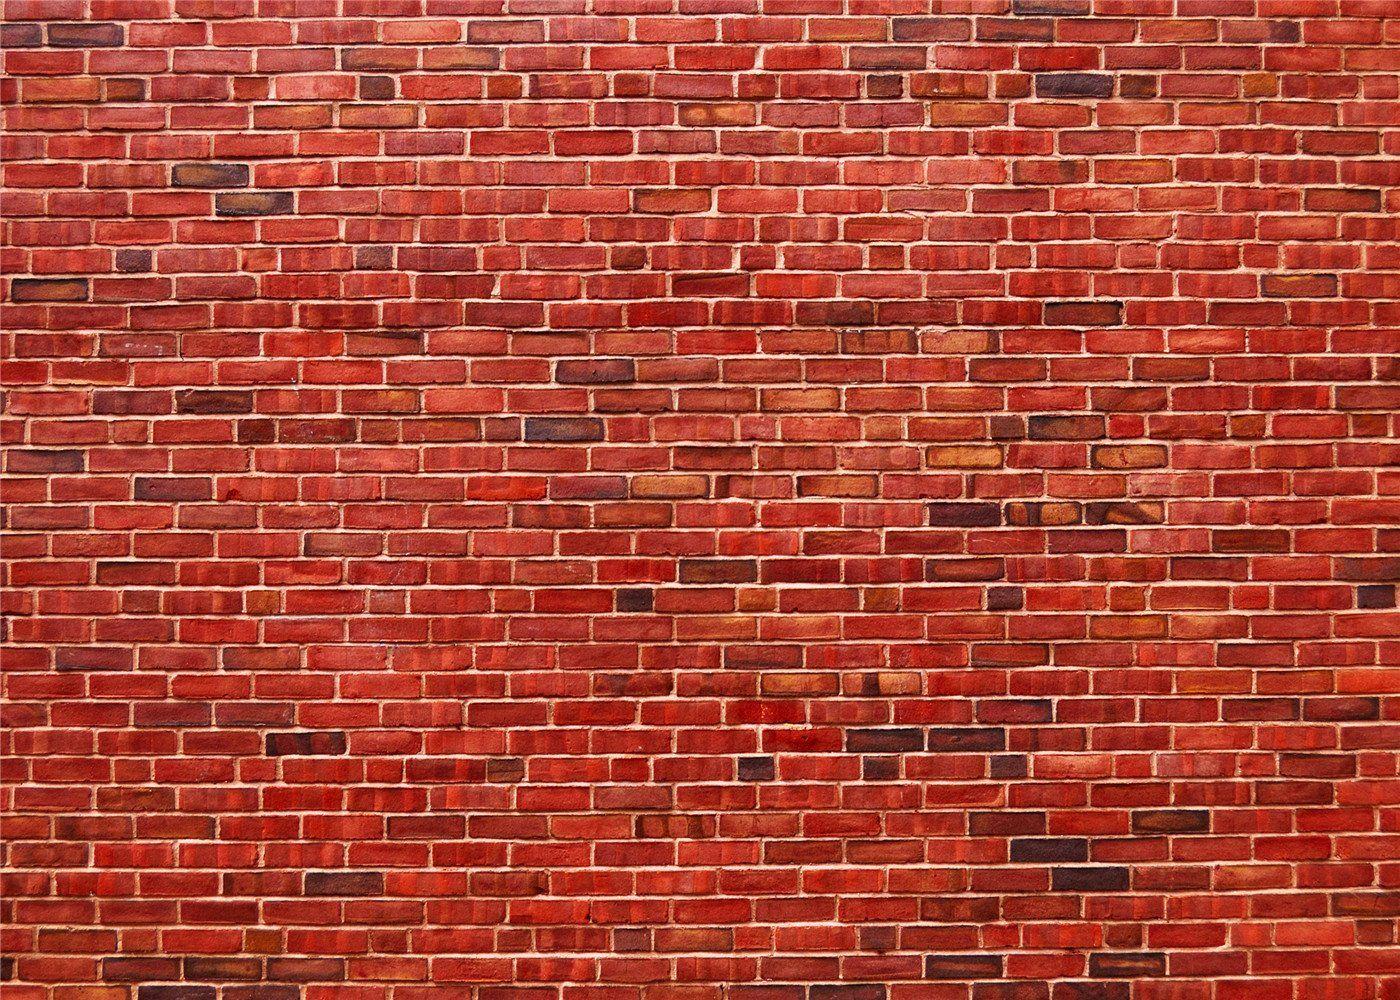 amazon com red brick wall photography backdrop vintage on brick wall id=55624